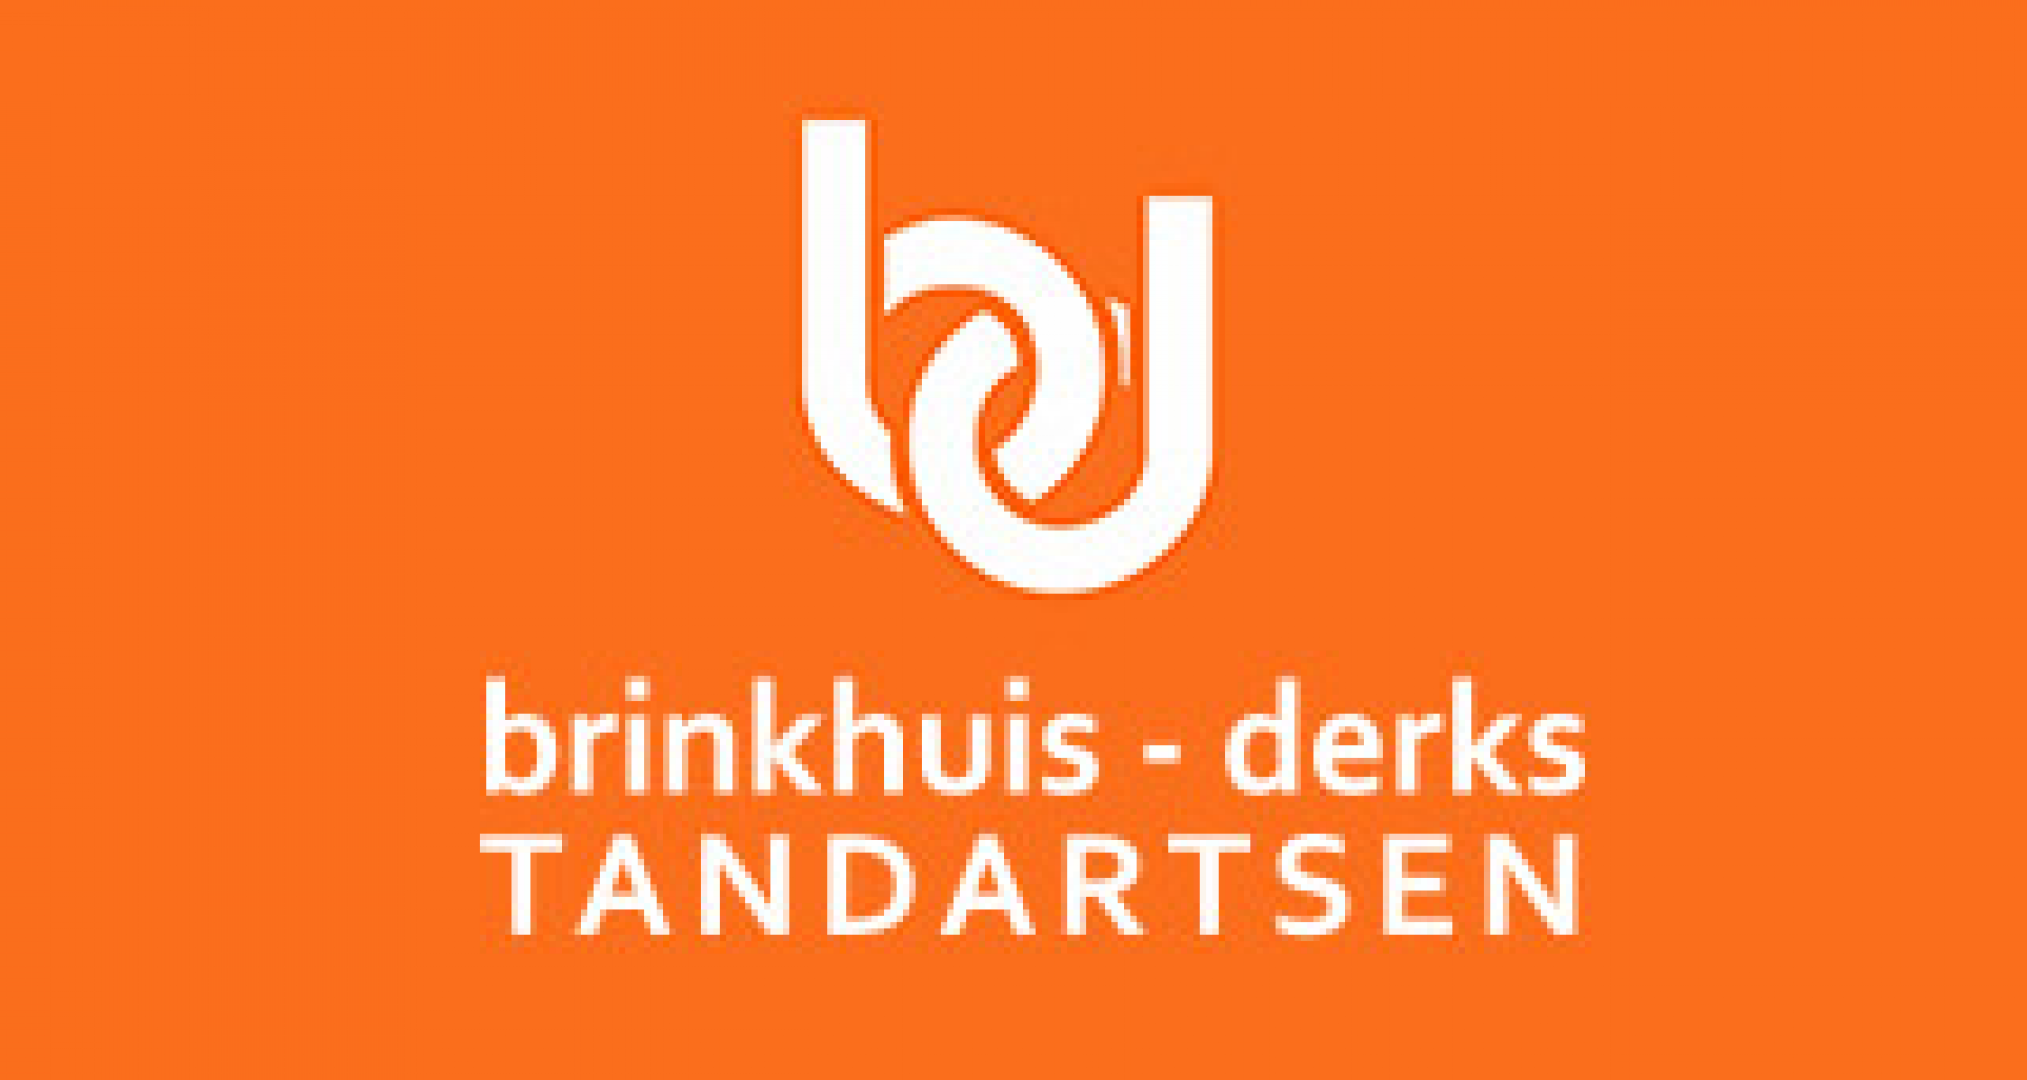 Brinkhuis - Derks Tandartsen